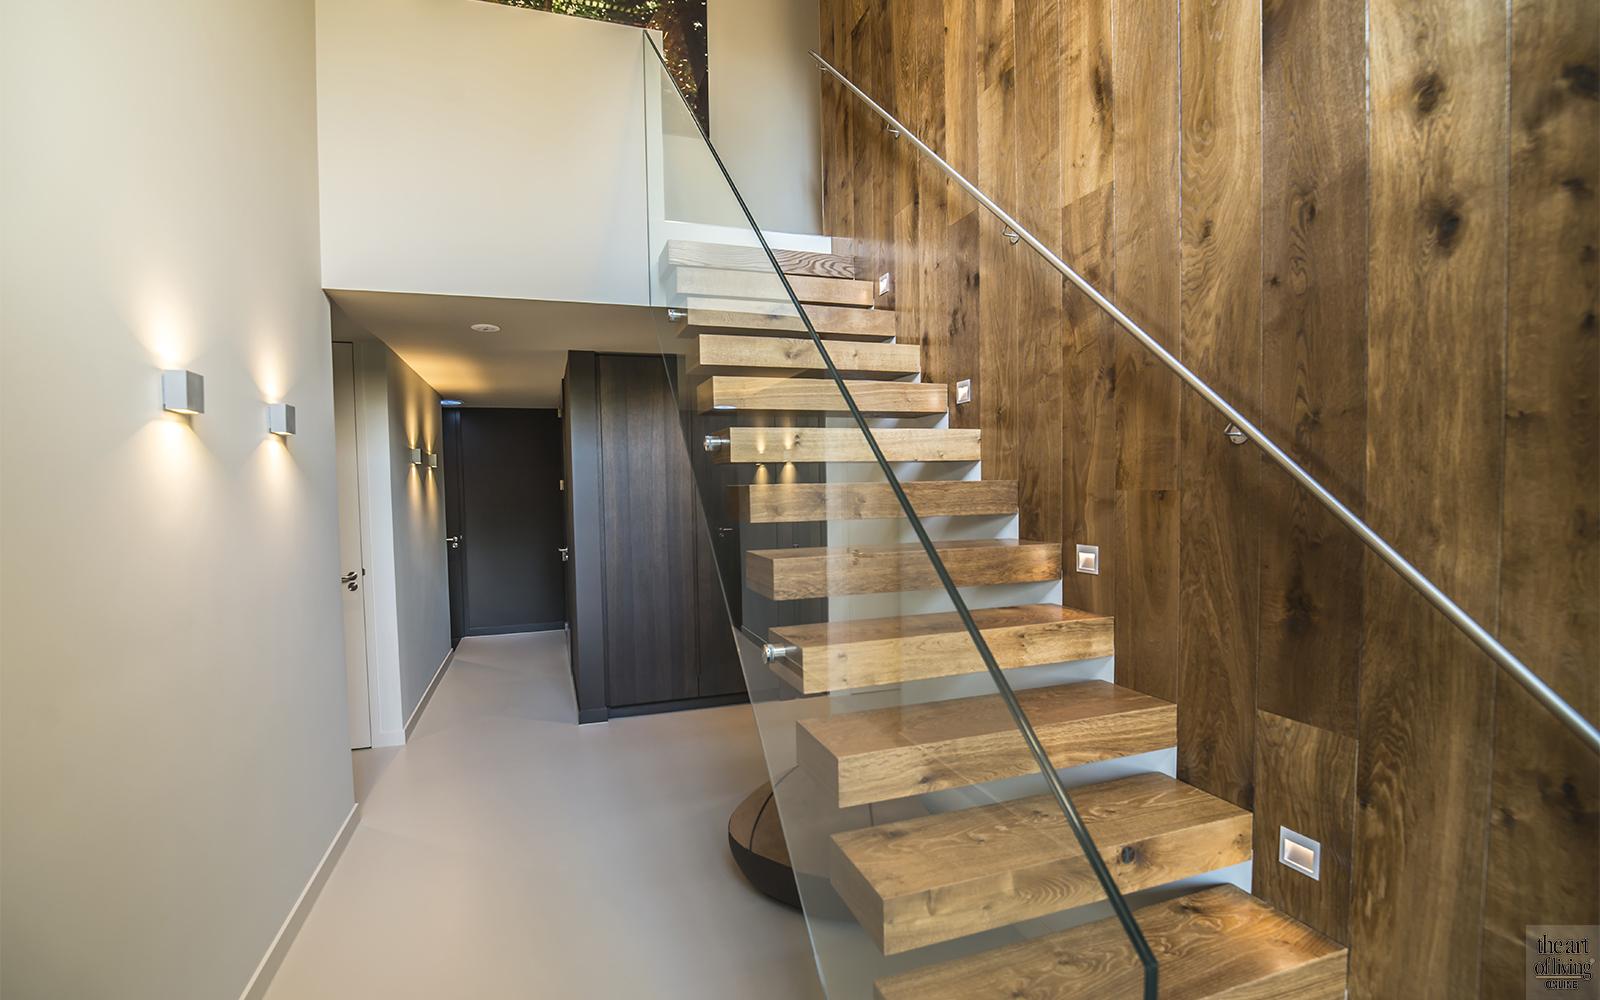 Studio Kees Marcelis, Villa, Kubistisch, Moderne villa, Modern interieur, Thuis bioscoop, houtentrap, vijver